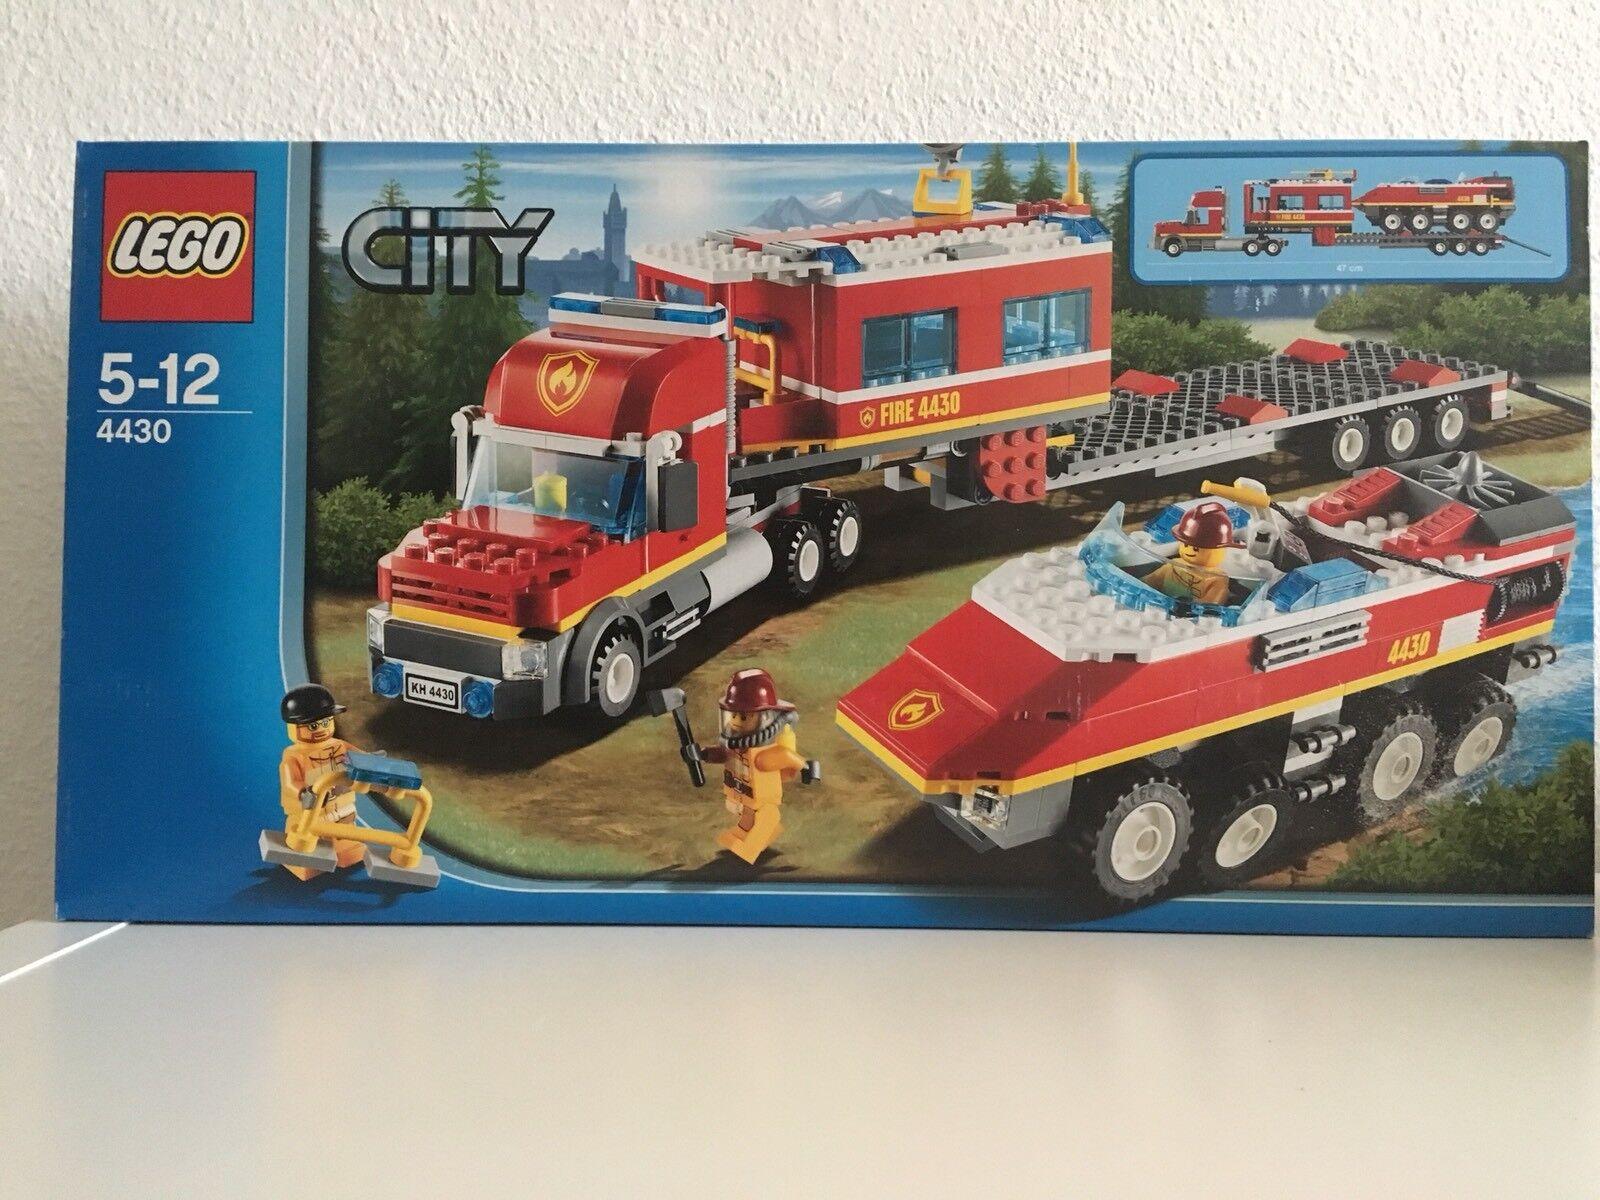 LEGO City 4430 Mobile Feuerwehrzentrale Rarität aus Sammlung Neu Neu Neu OVP Feuerwehr b309b8